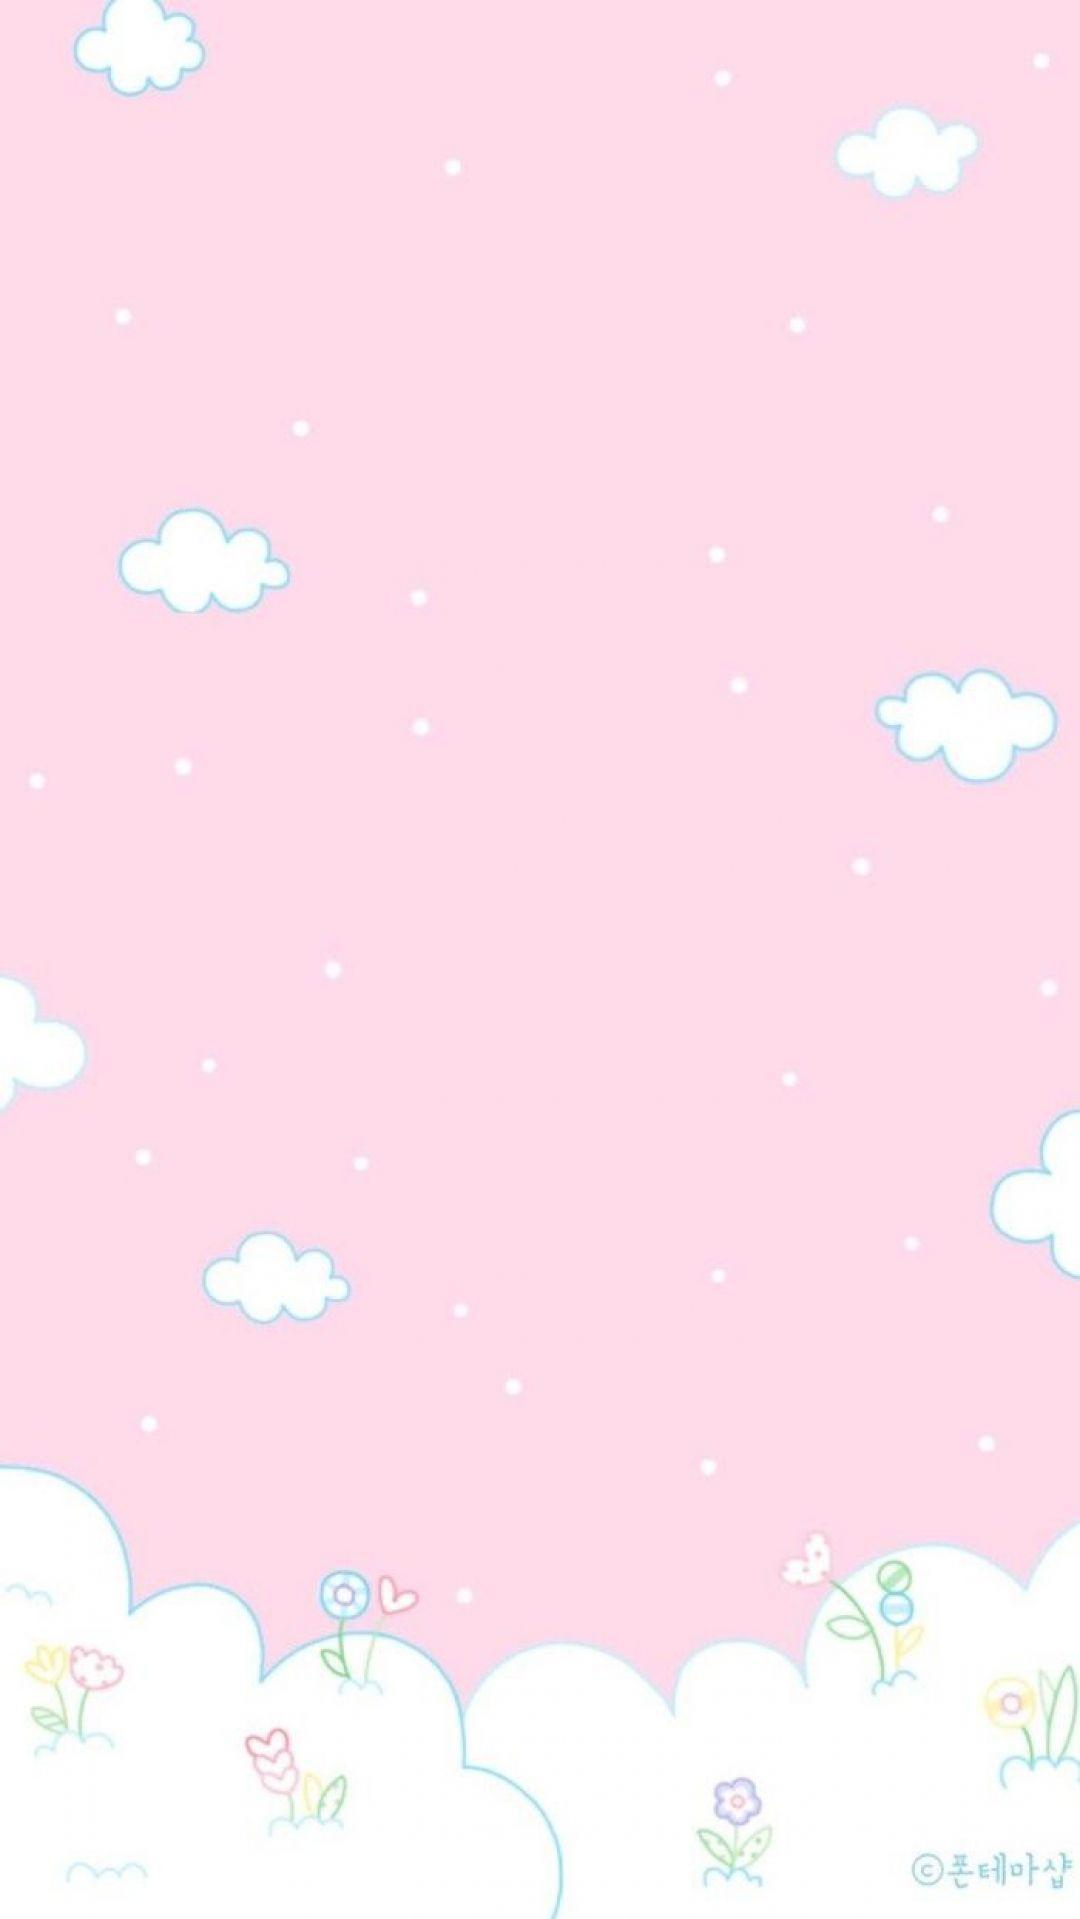 Kawaii Pixel Wallpapers Top Free Kawaii Pixel Backgrounds Wallpaperaccess